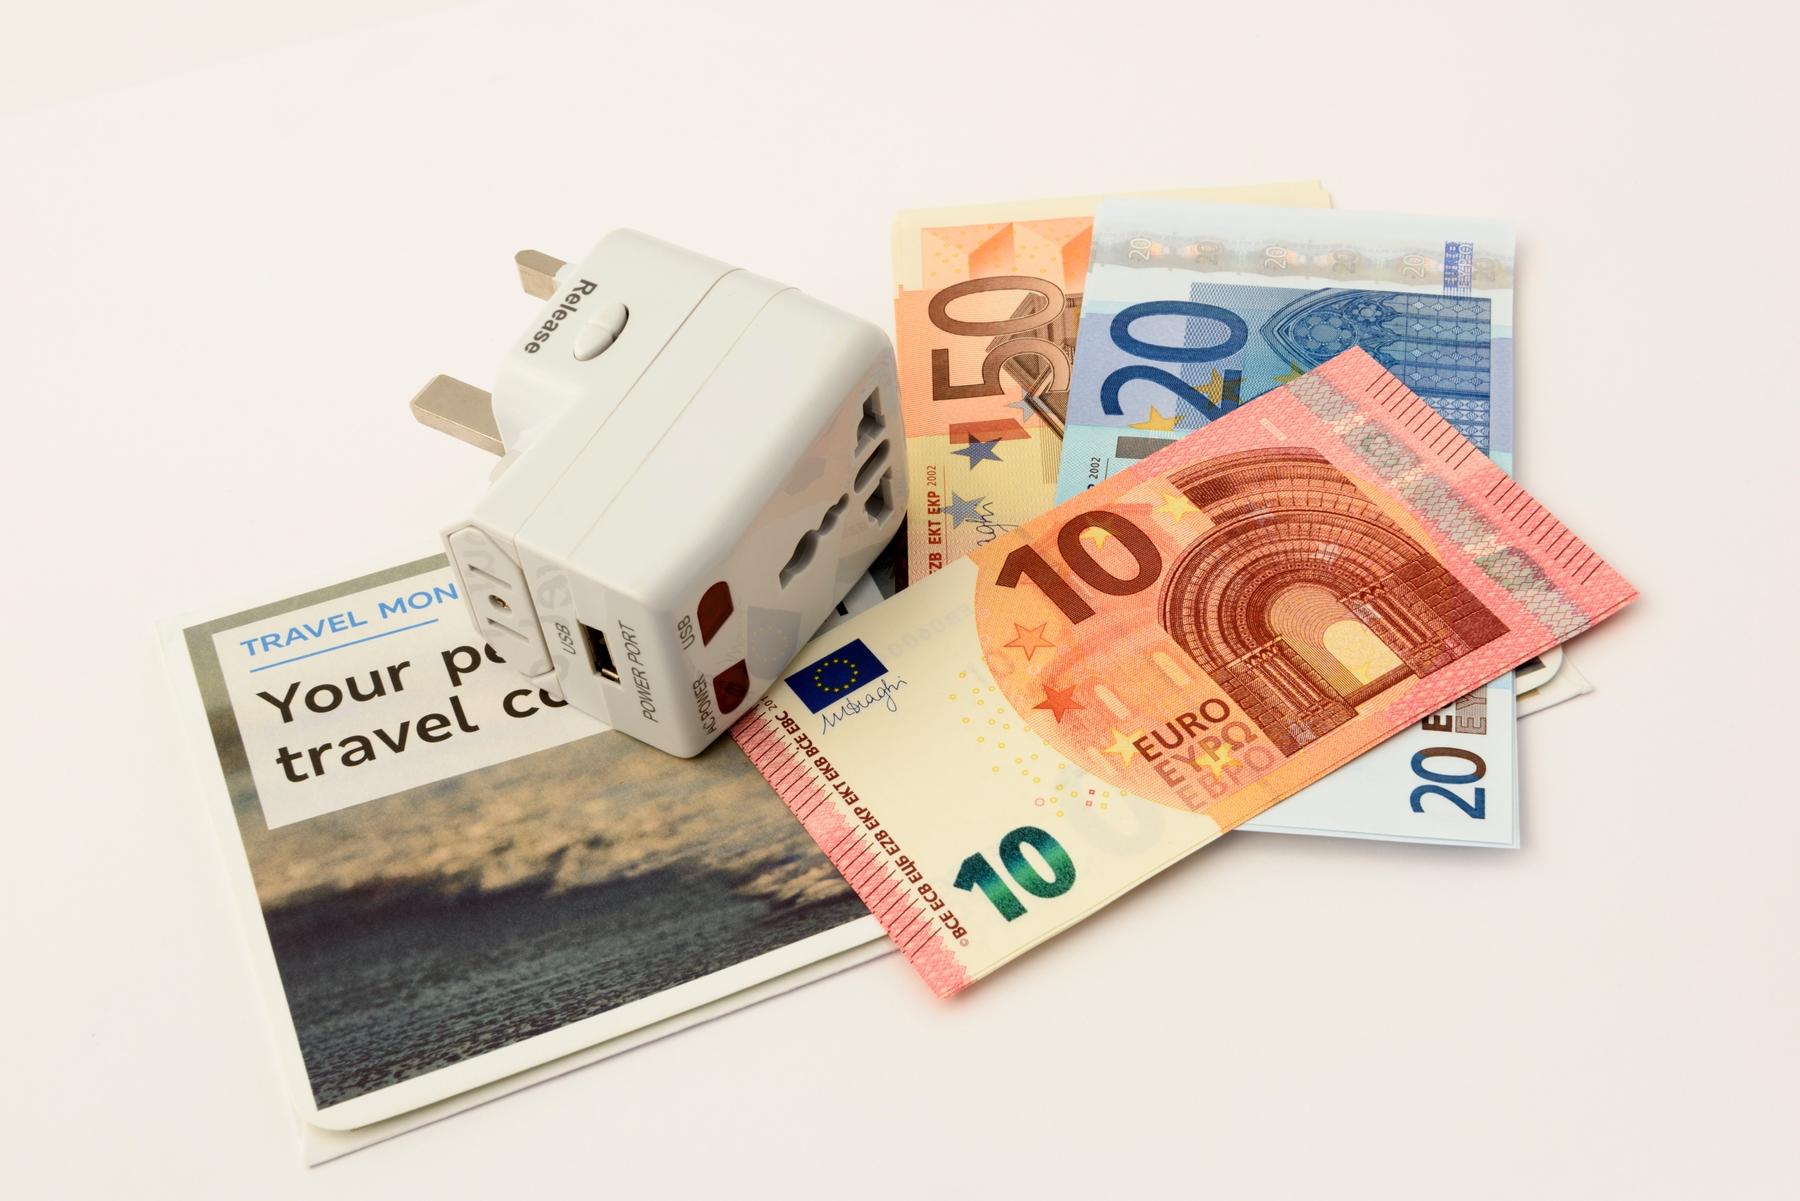 you'll need an international travel plug adaptor when you travel